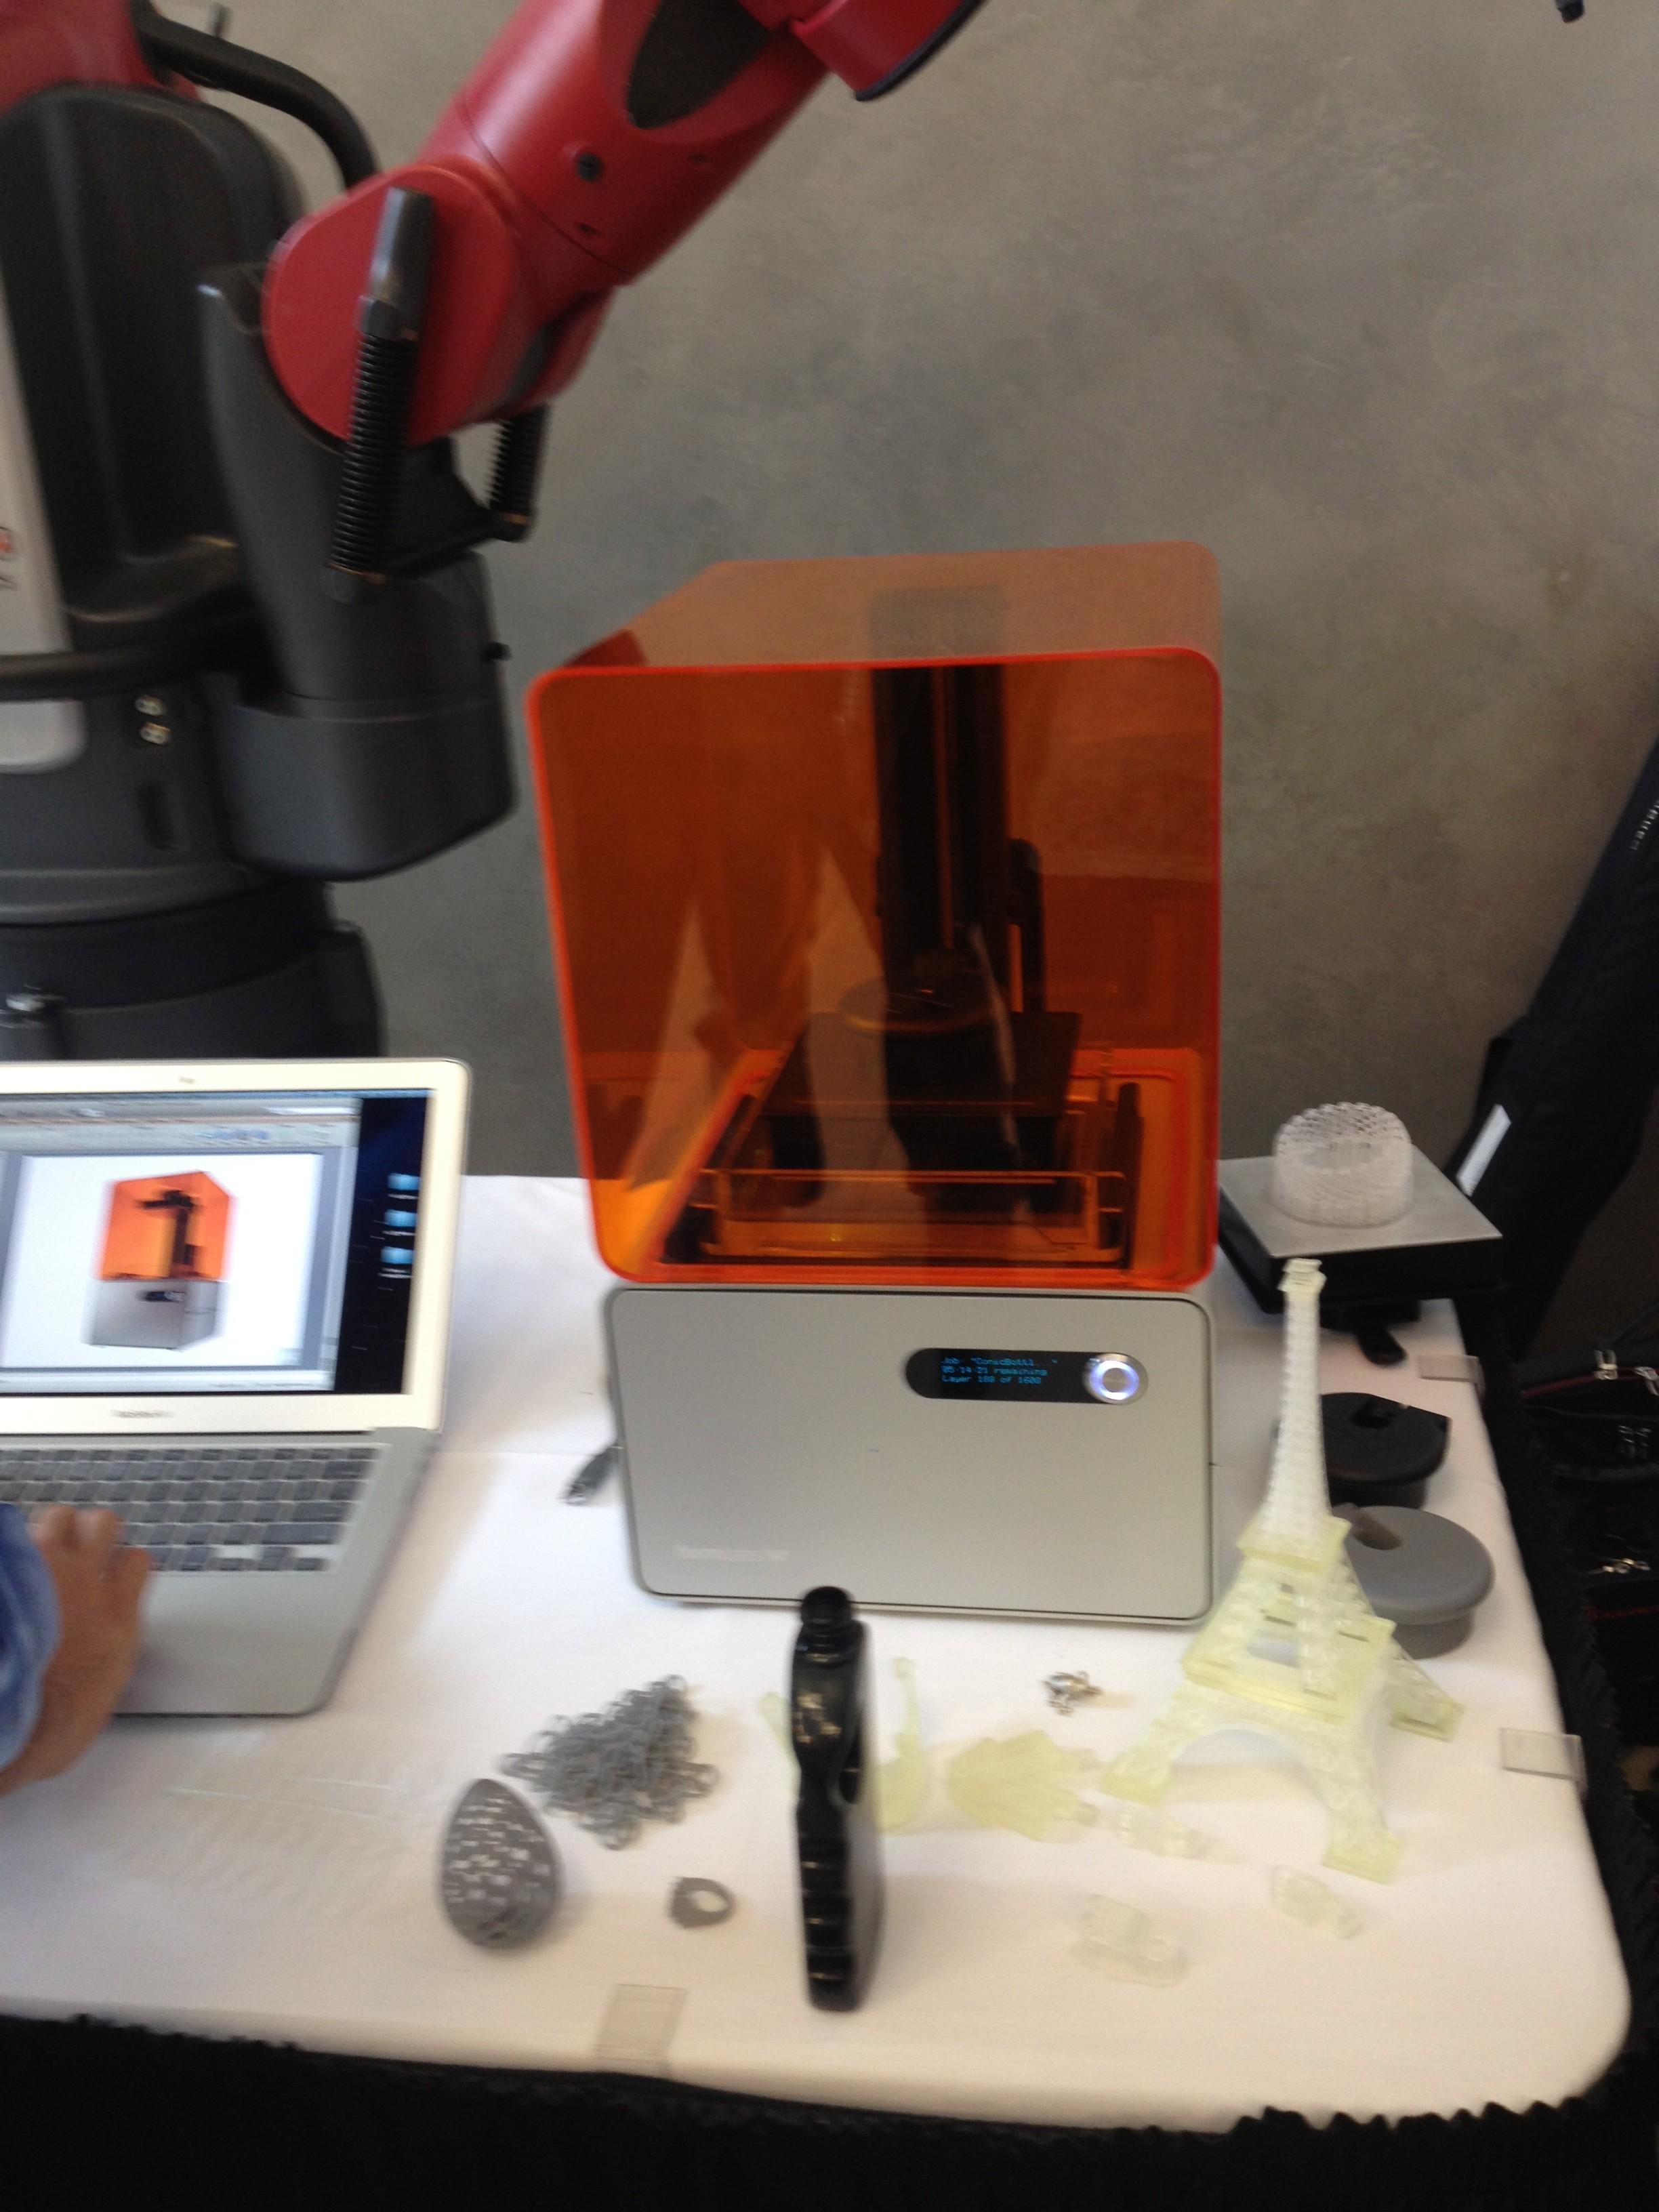 ReThink Robotics, Formlabs, and Knapheide Manufacturing Corporation Push Design Limits at SolidWorks 2014 Press Event